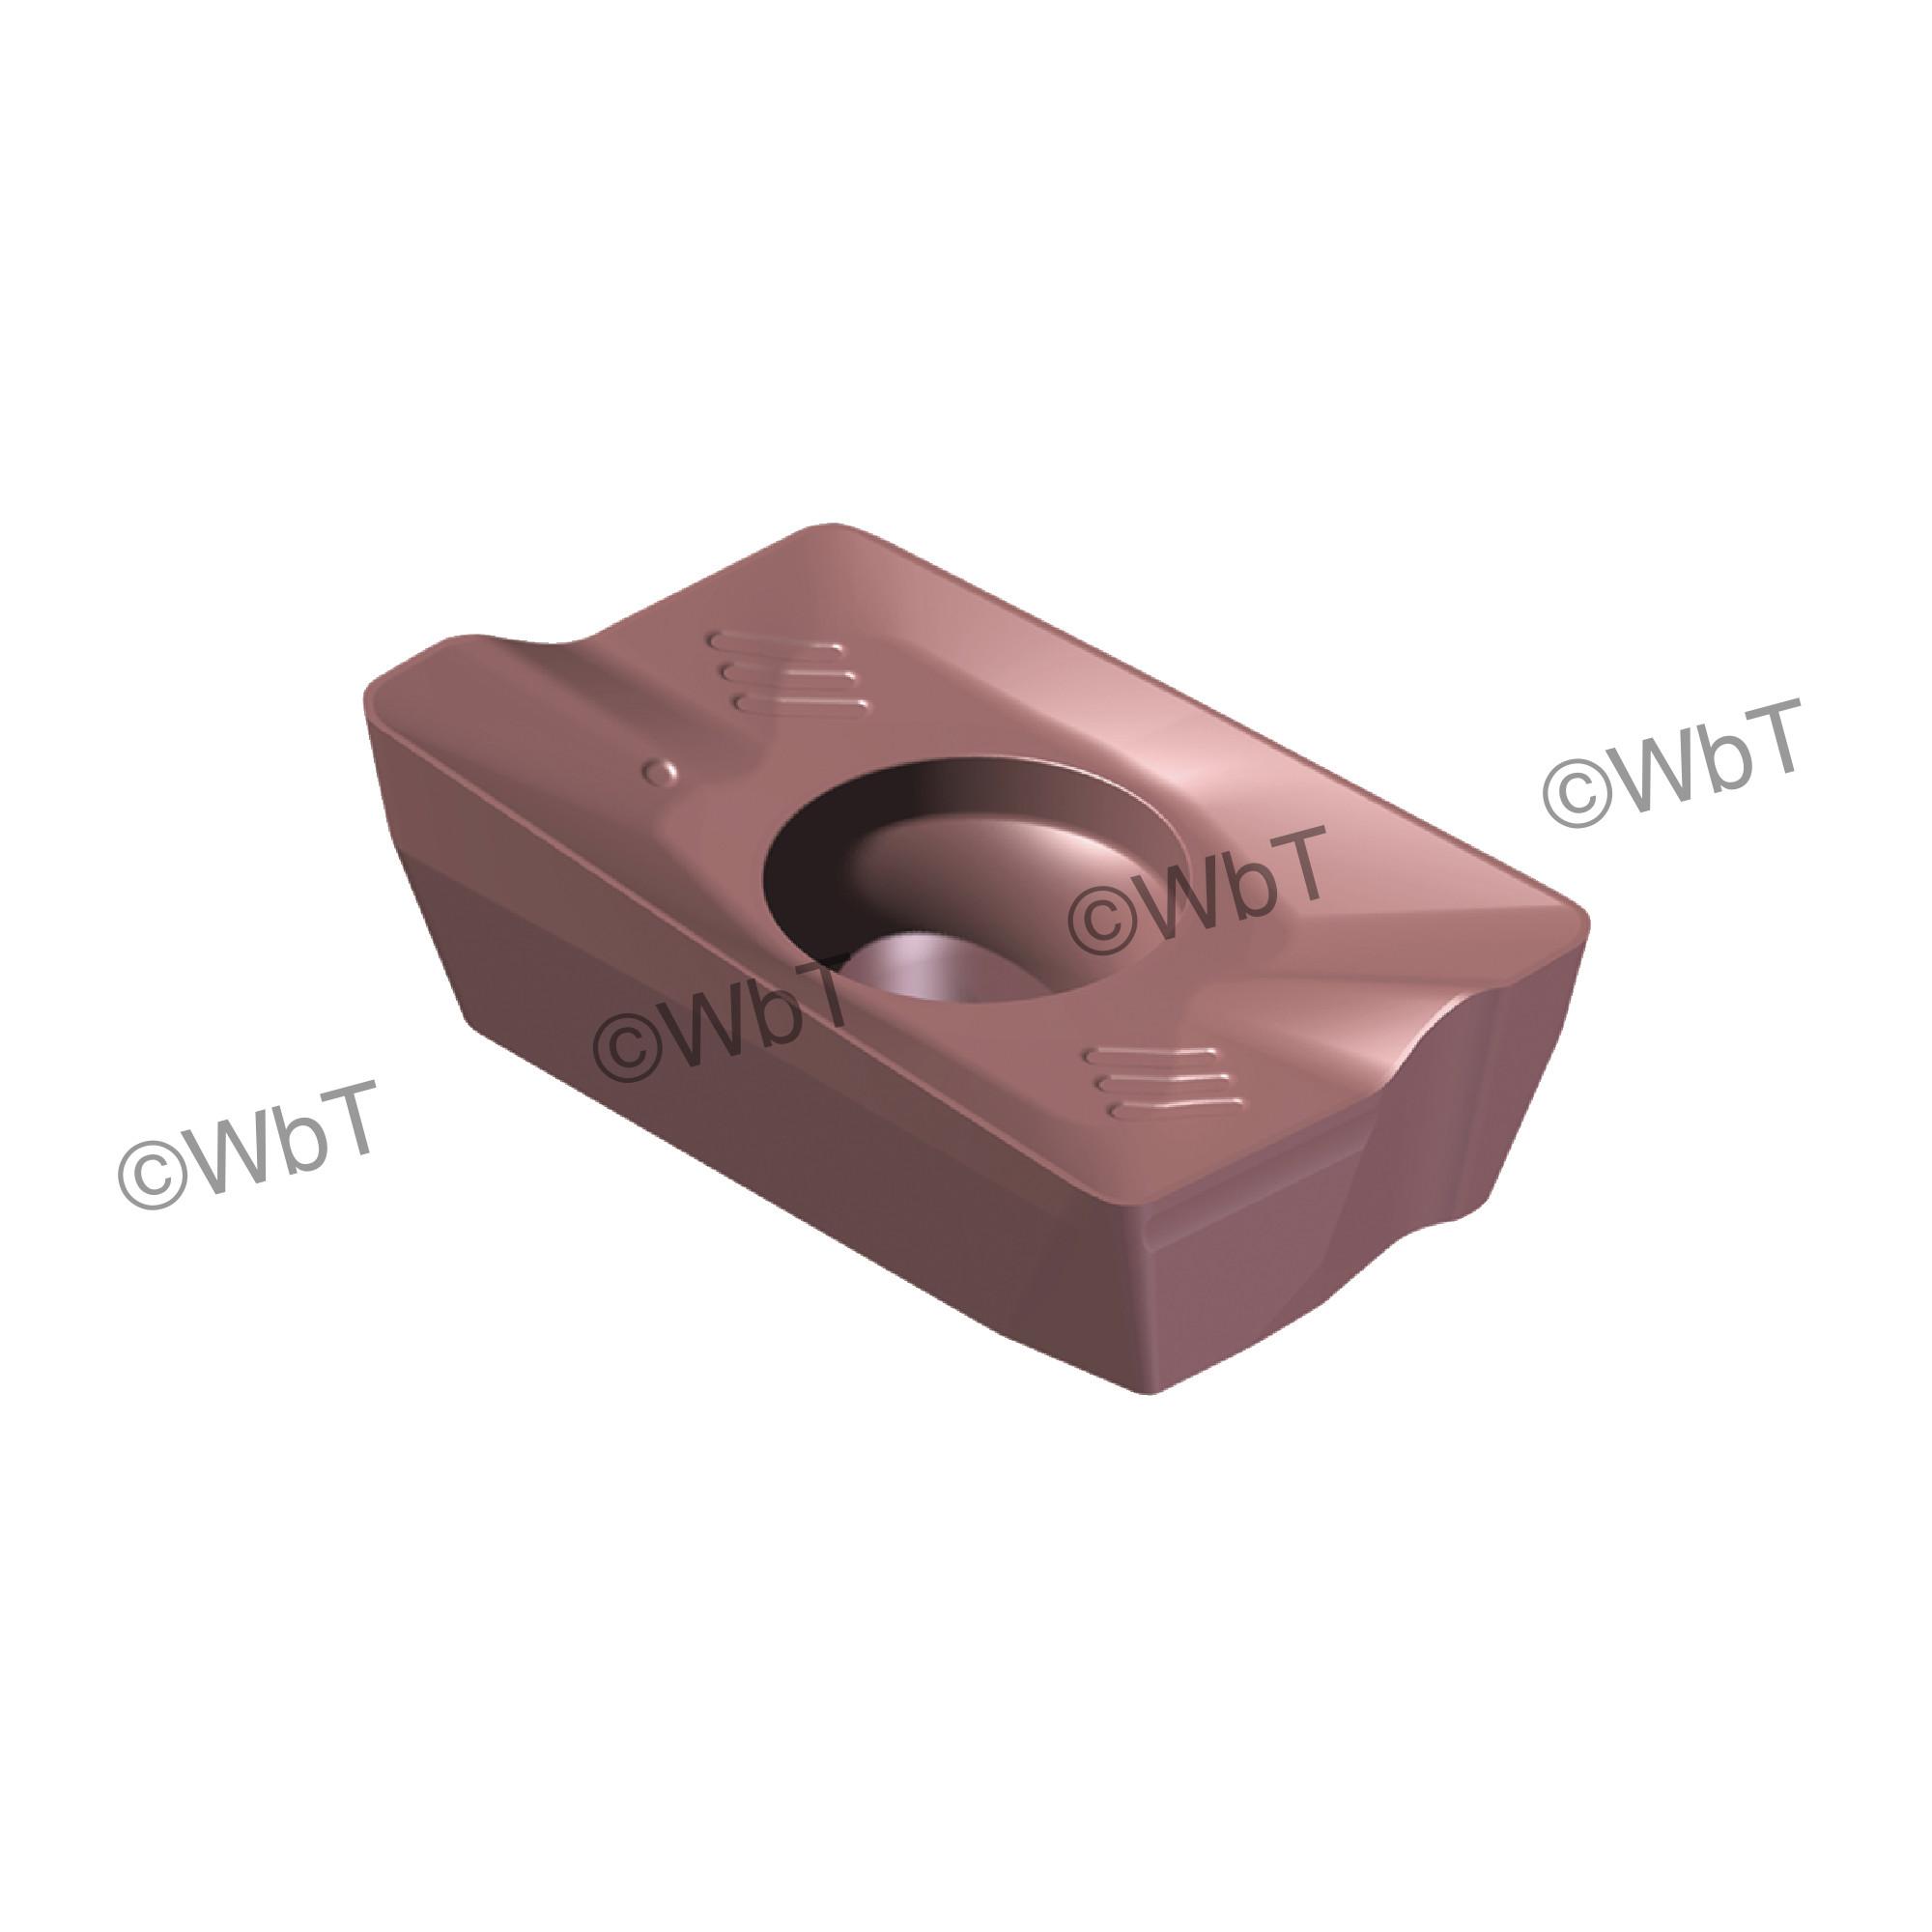 AKUMA - APKT1003PDR-M1 PM15M Parallelogram / Indexable Carbide Milling Insert